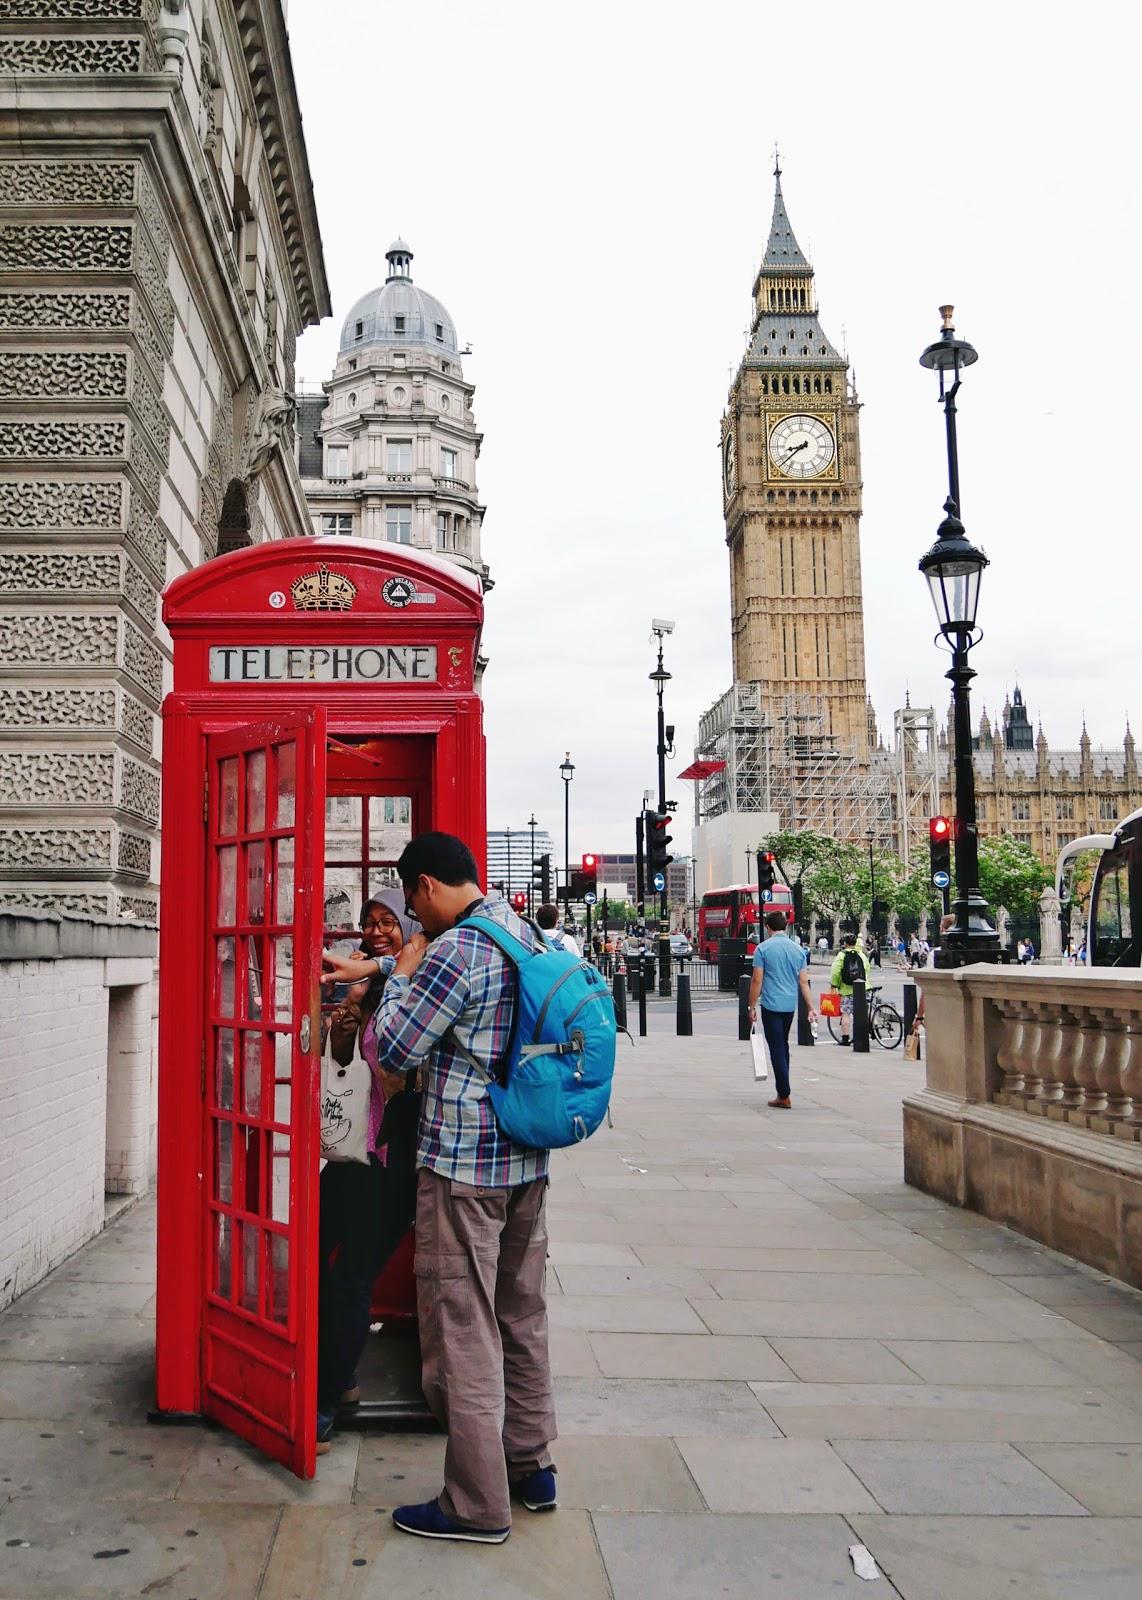 Mengurus Visa UK Sendiri? Ini Panduannya